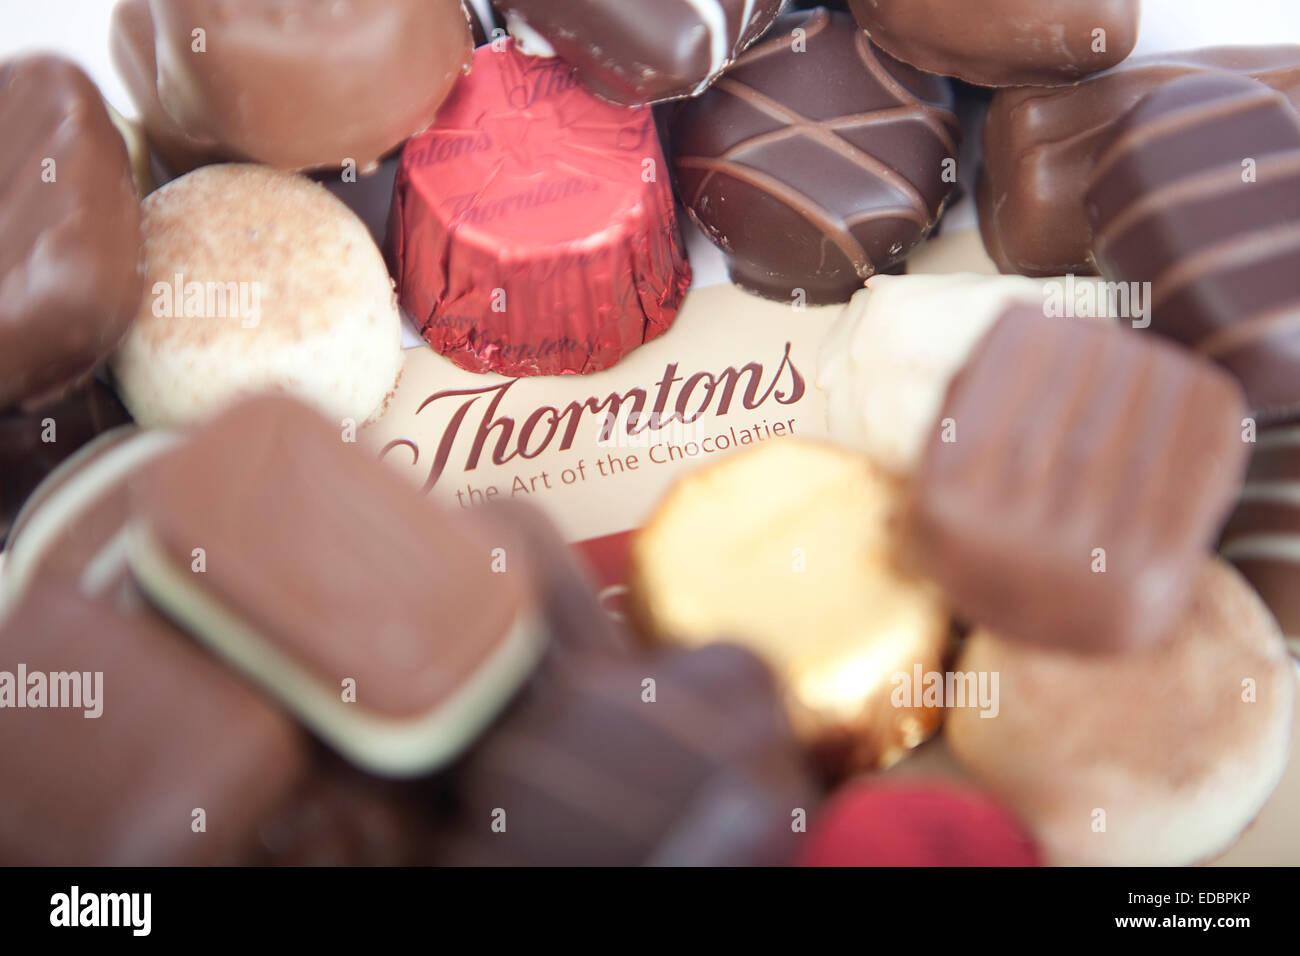 Image d'illustration de Thorntons chocolat. Photo Stock